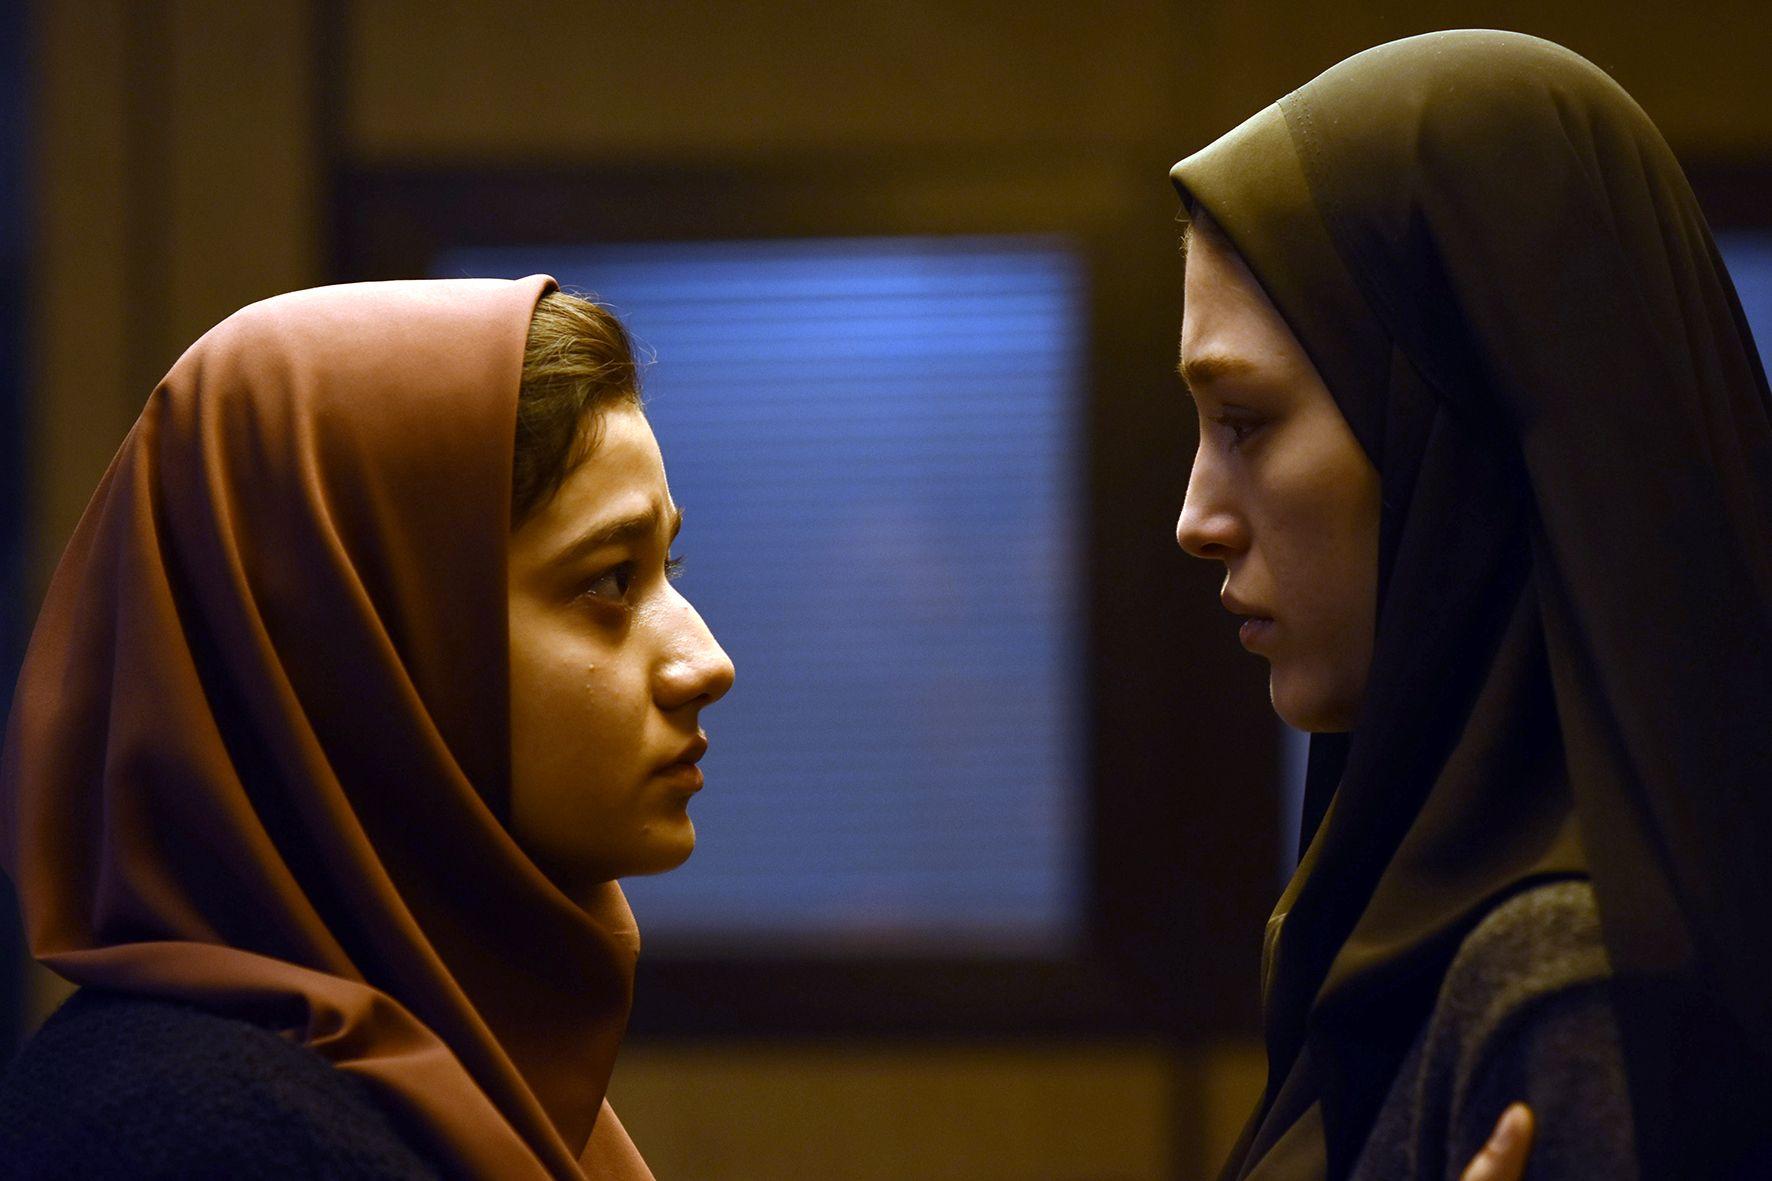 YALDA, A NIGHT FOR FORGIVENESS, directed by Massoud Bakhshi.